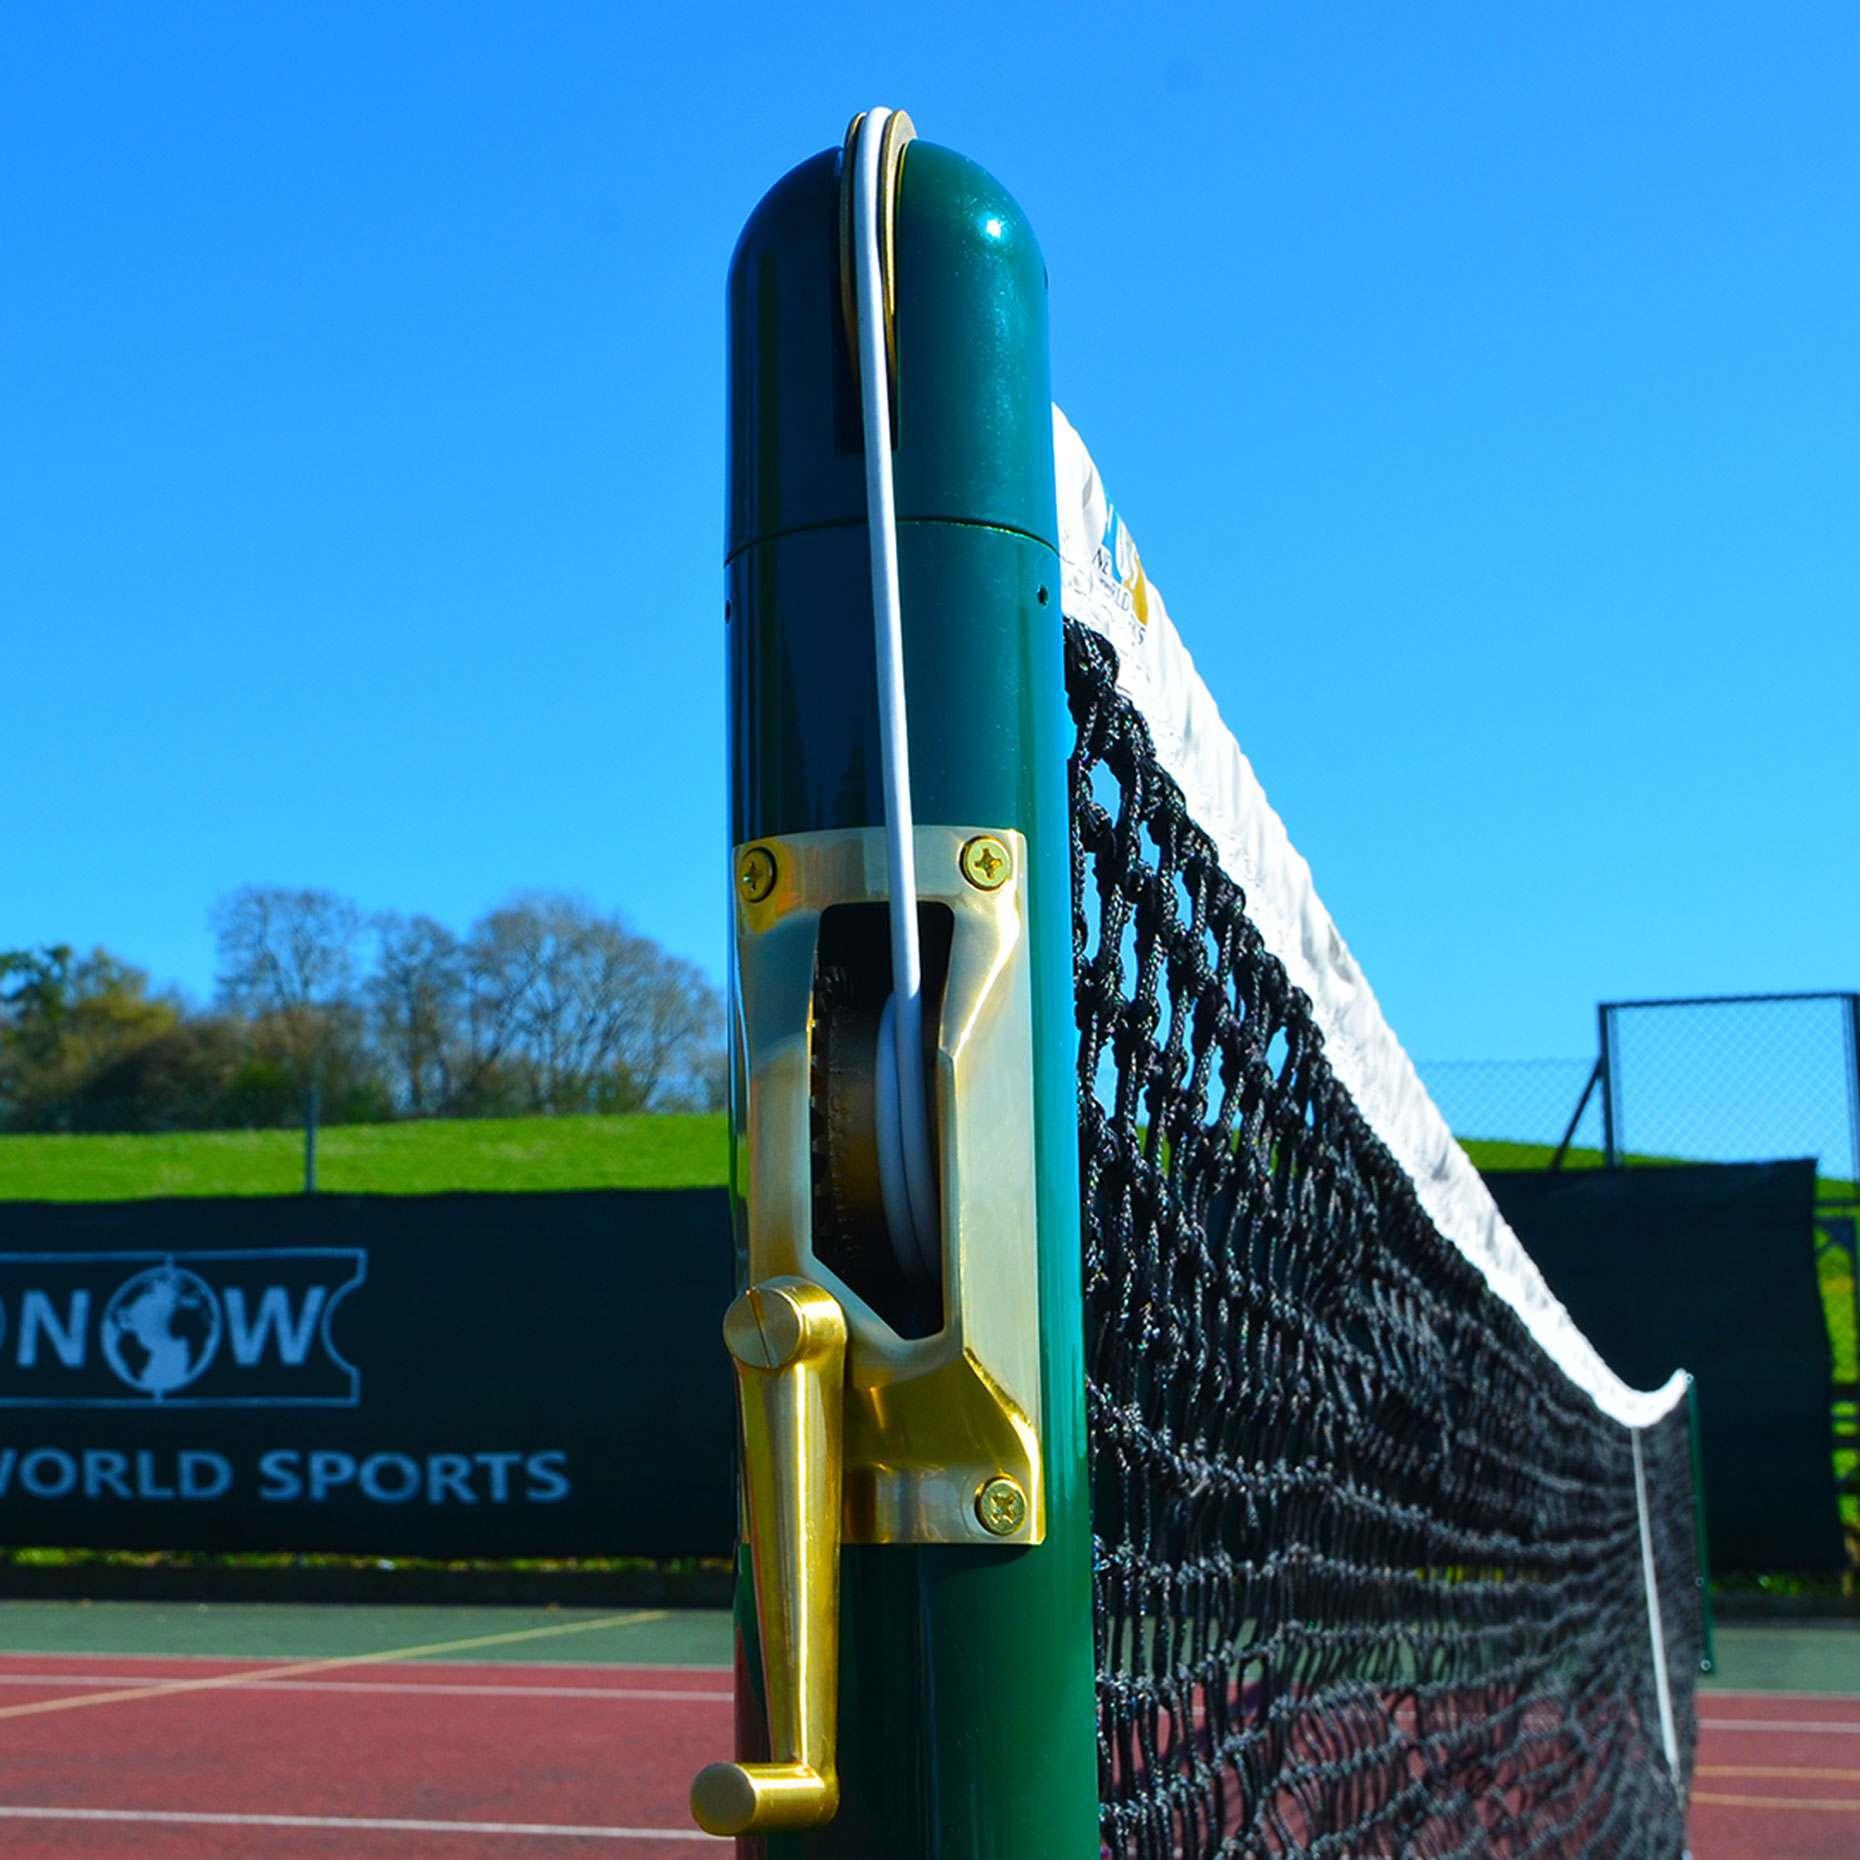 FORTIS Round Tennis Posts